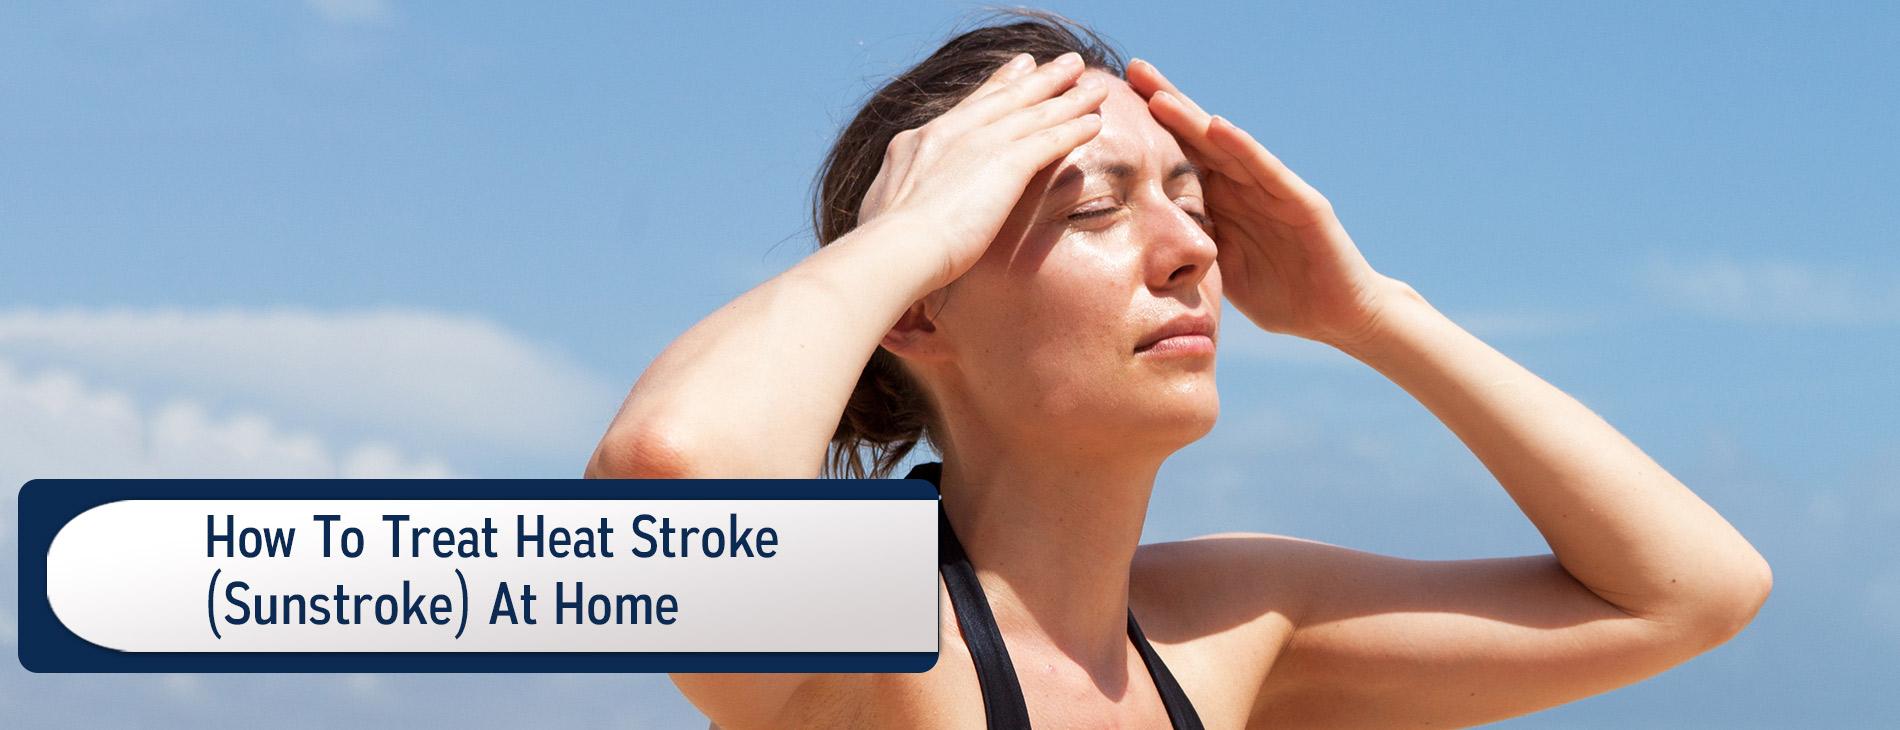 How-To-Treat-Heat-Stroke-(Sunstroke)-At-Home